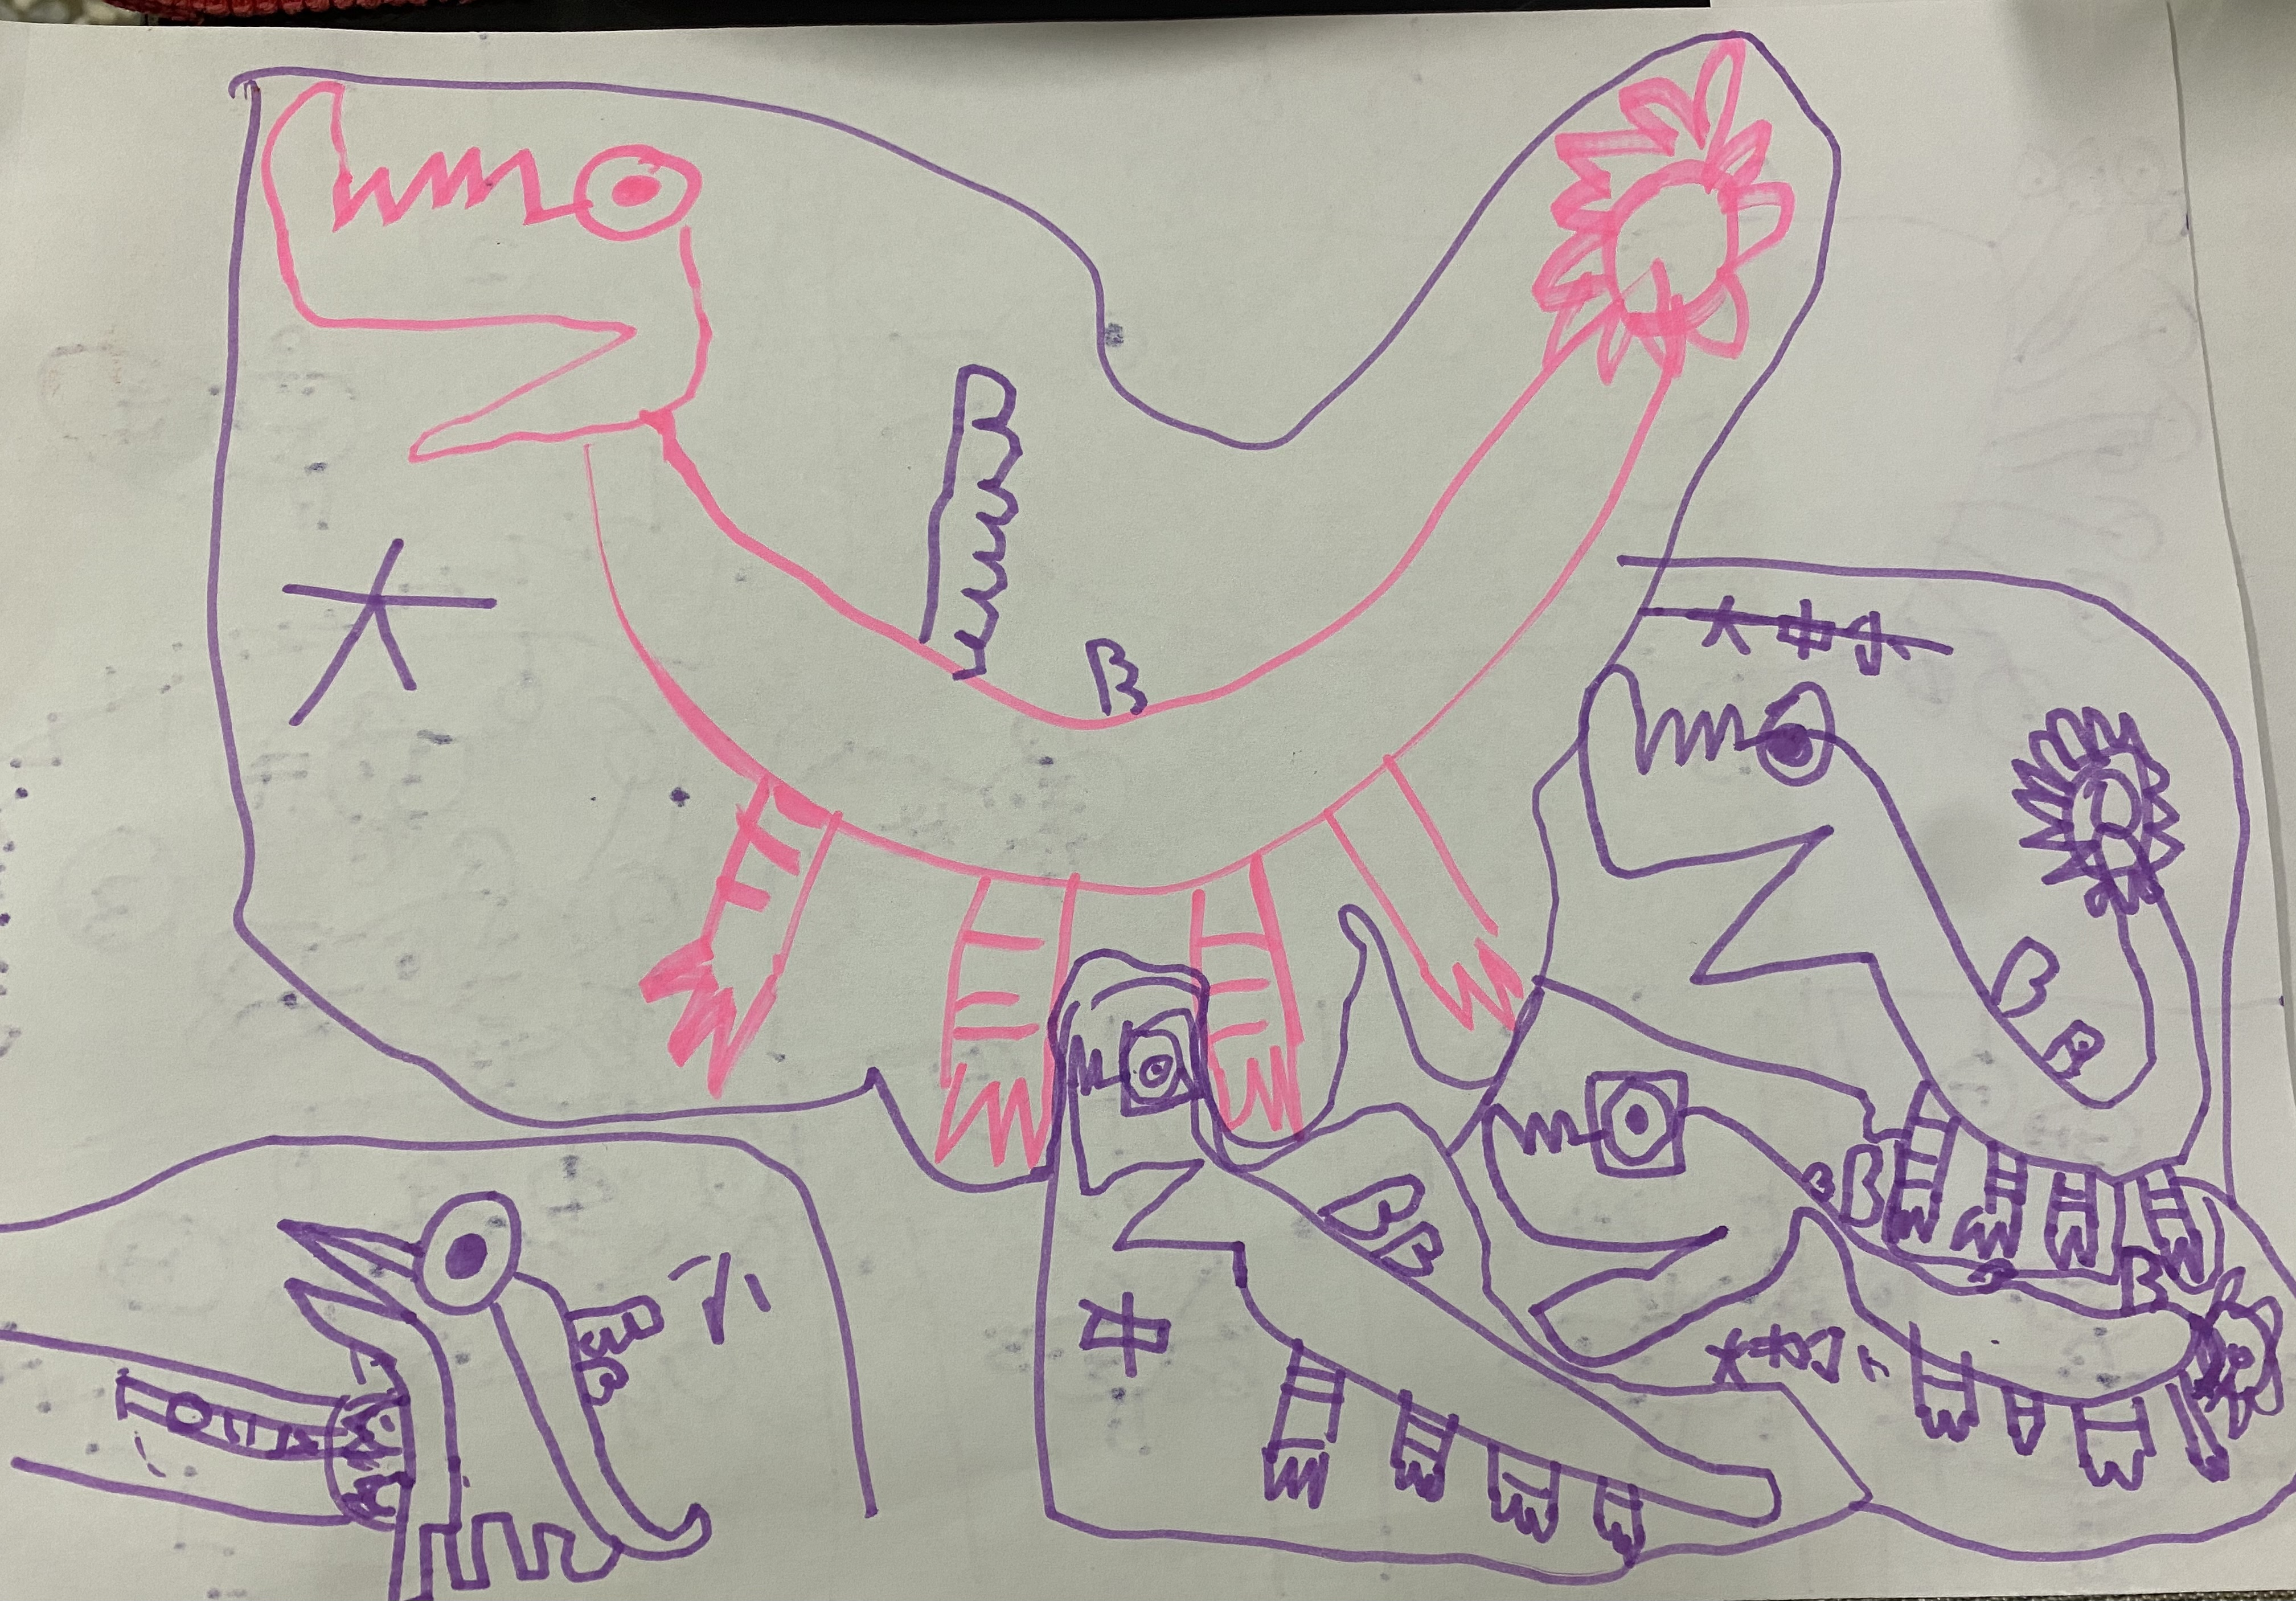 S2-301/  [非故事]小鼻龍和企鵝弟弟妹妹的說故事XDDD-1